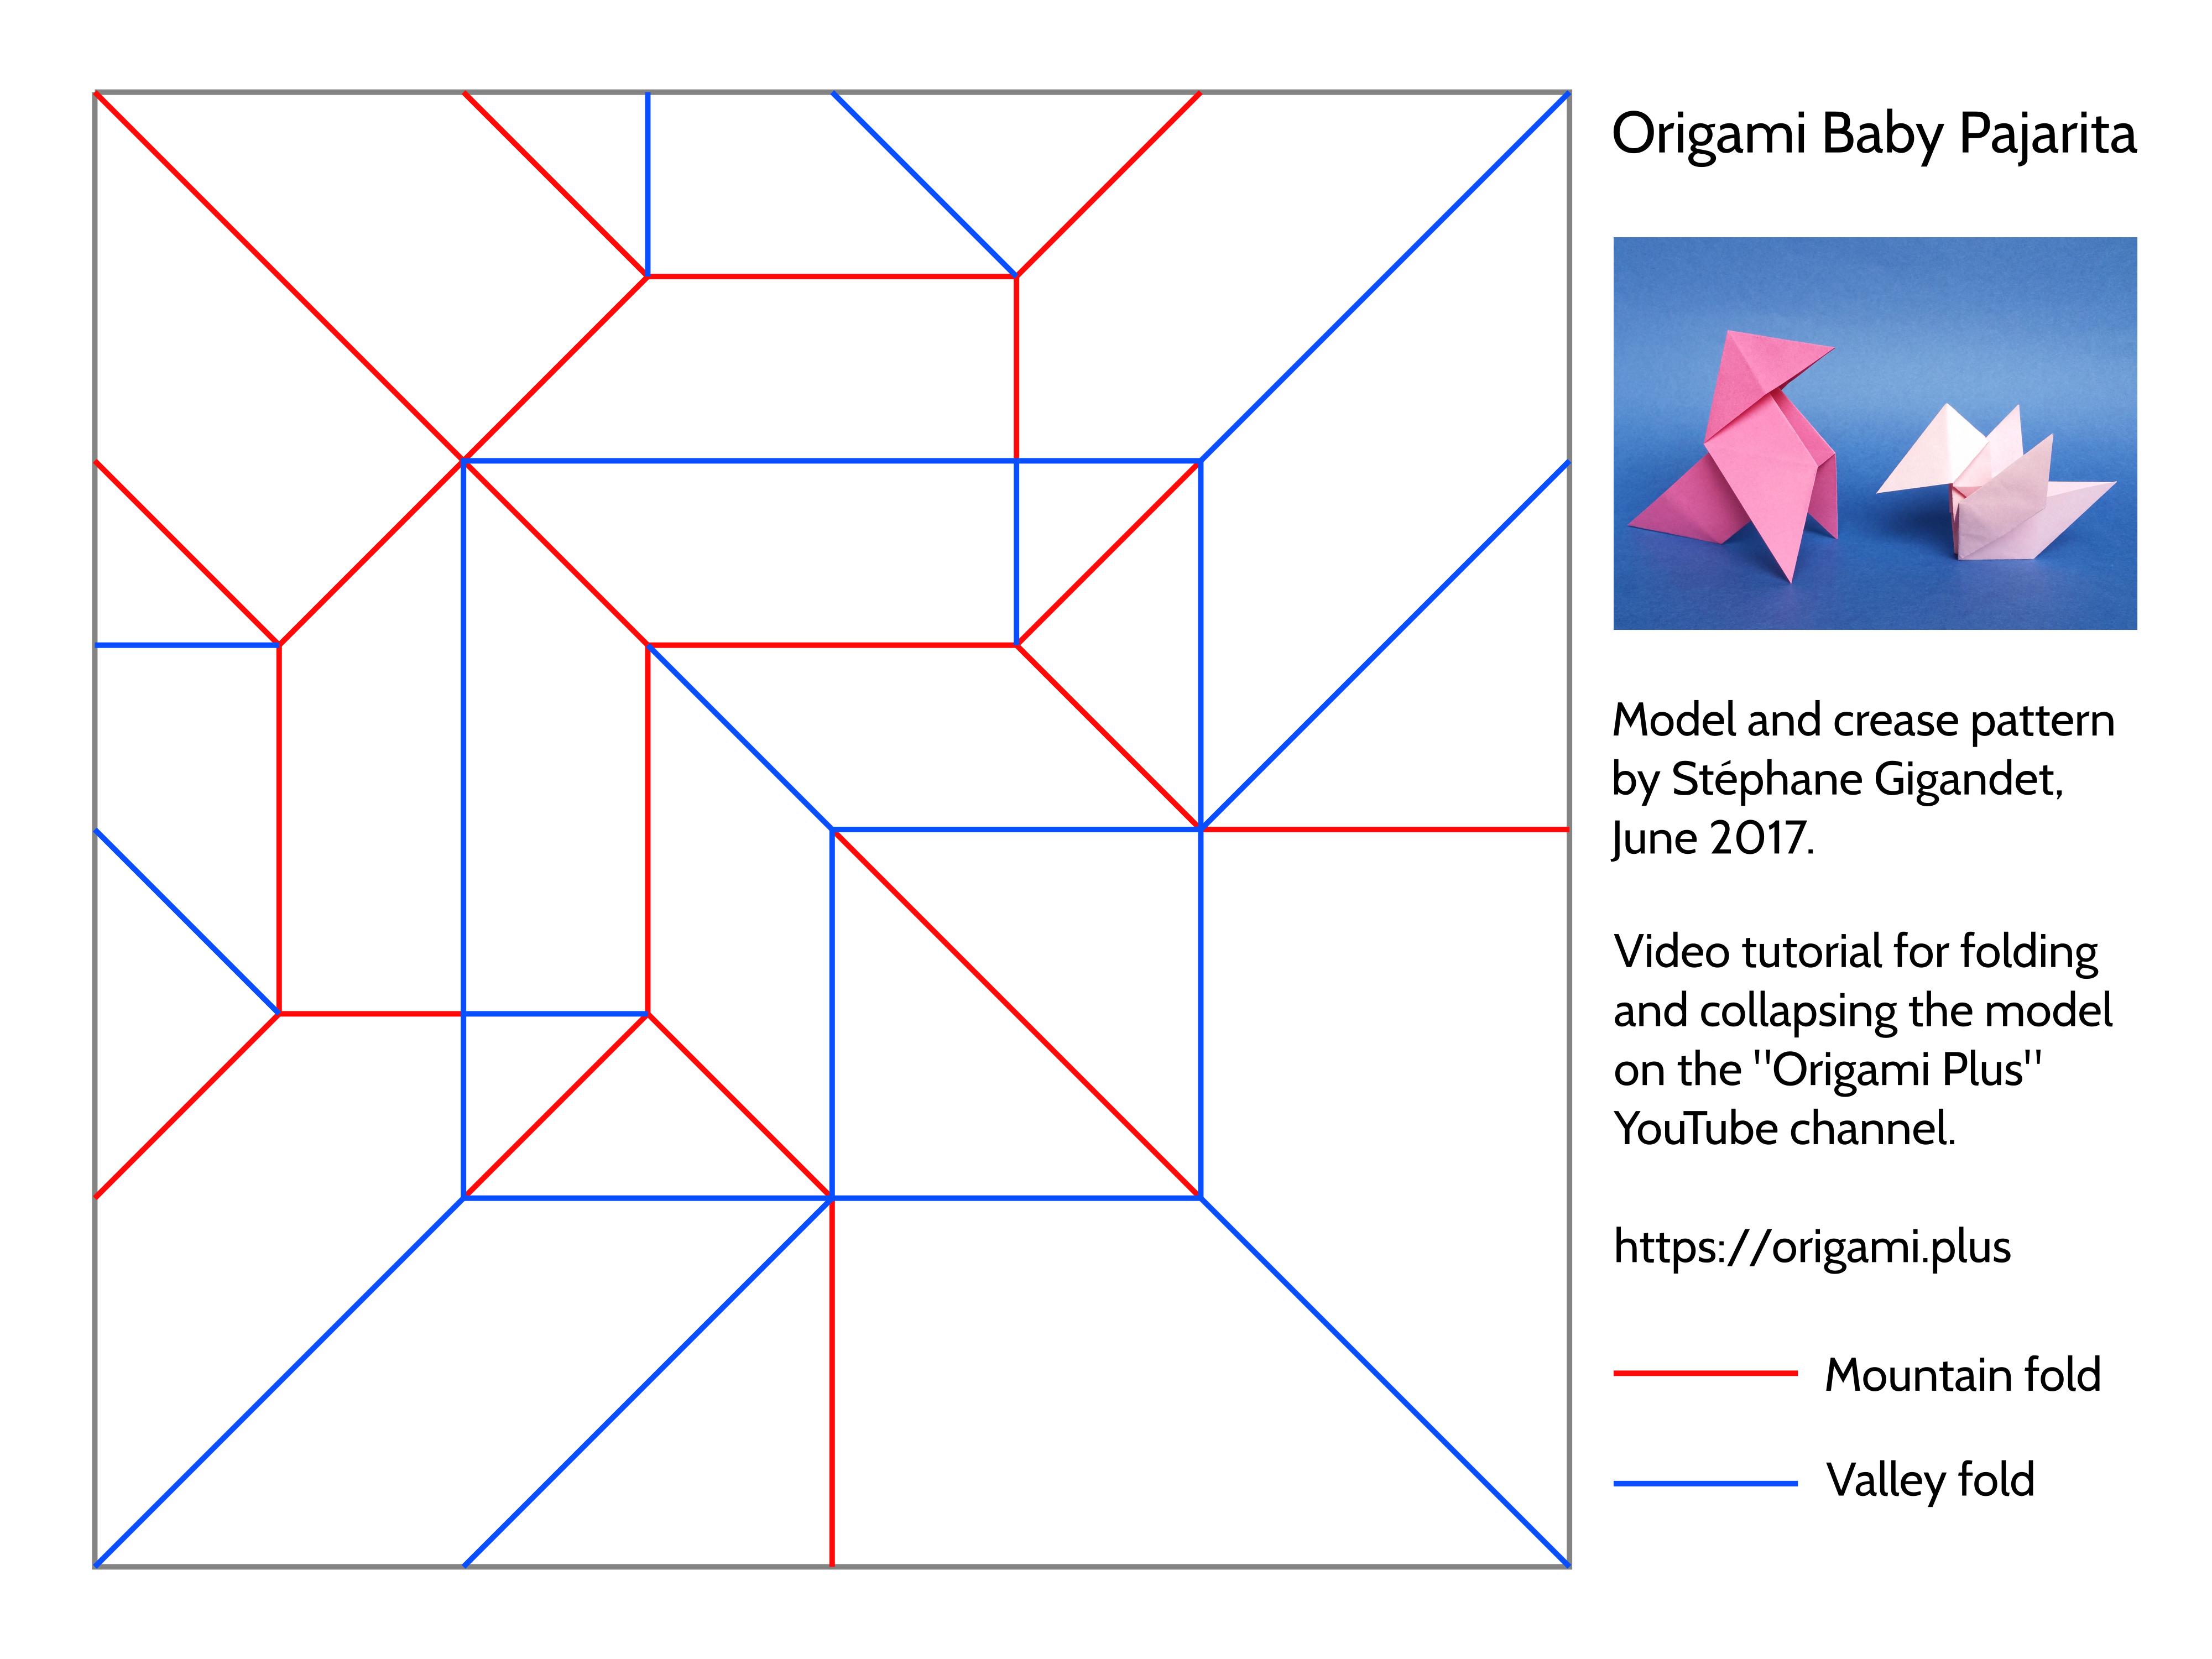 Baby pajarita 1g printable crease pattern for the baby pajarita origami model jeuxipadfo Image collections